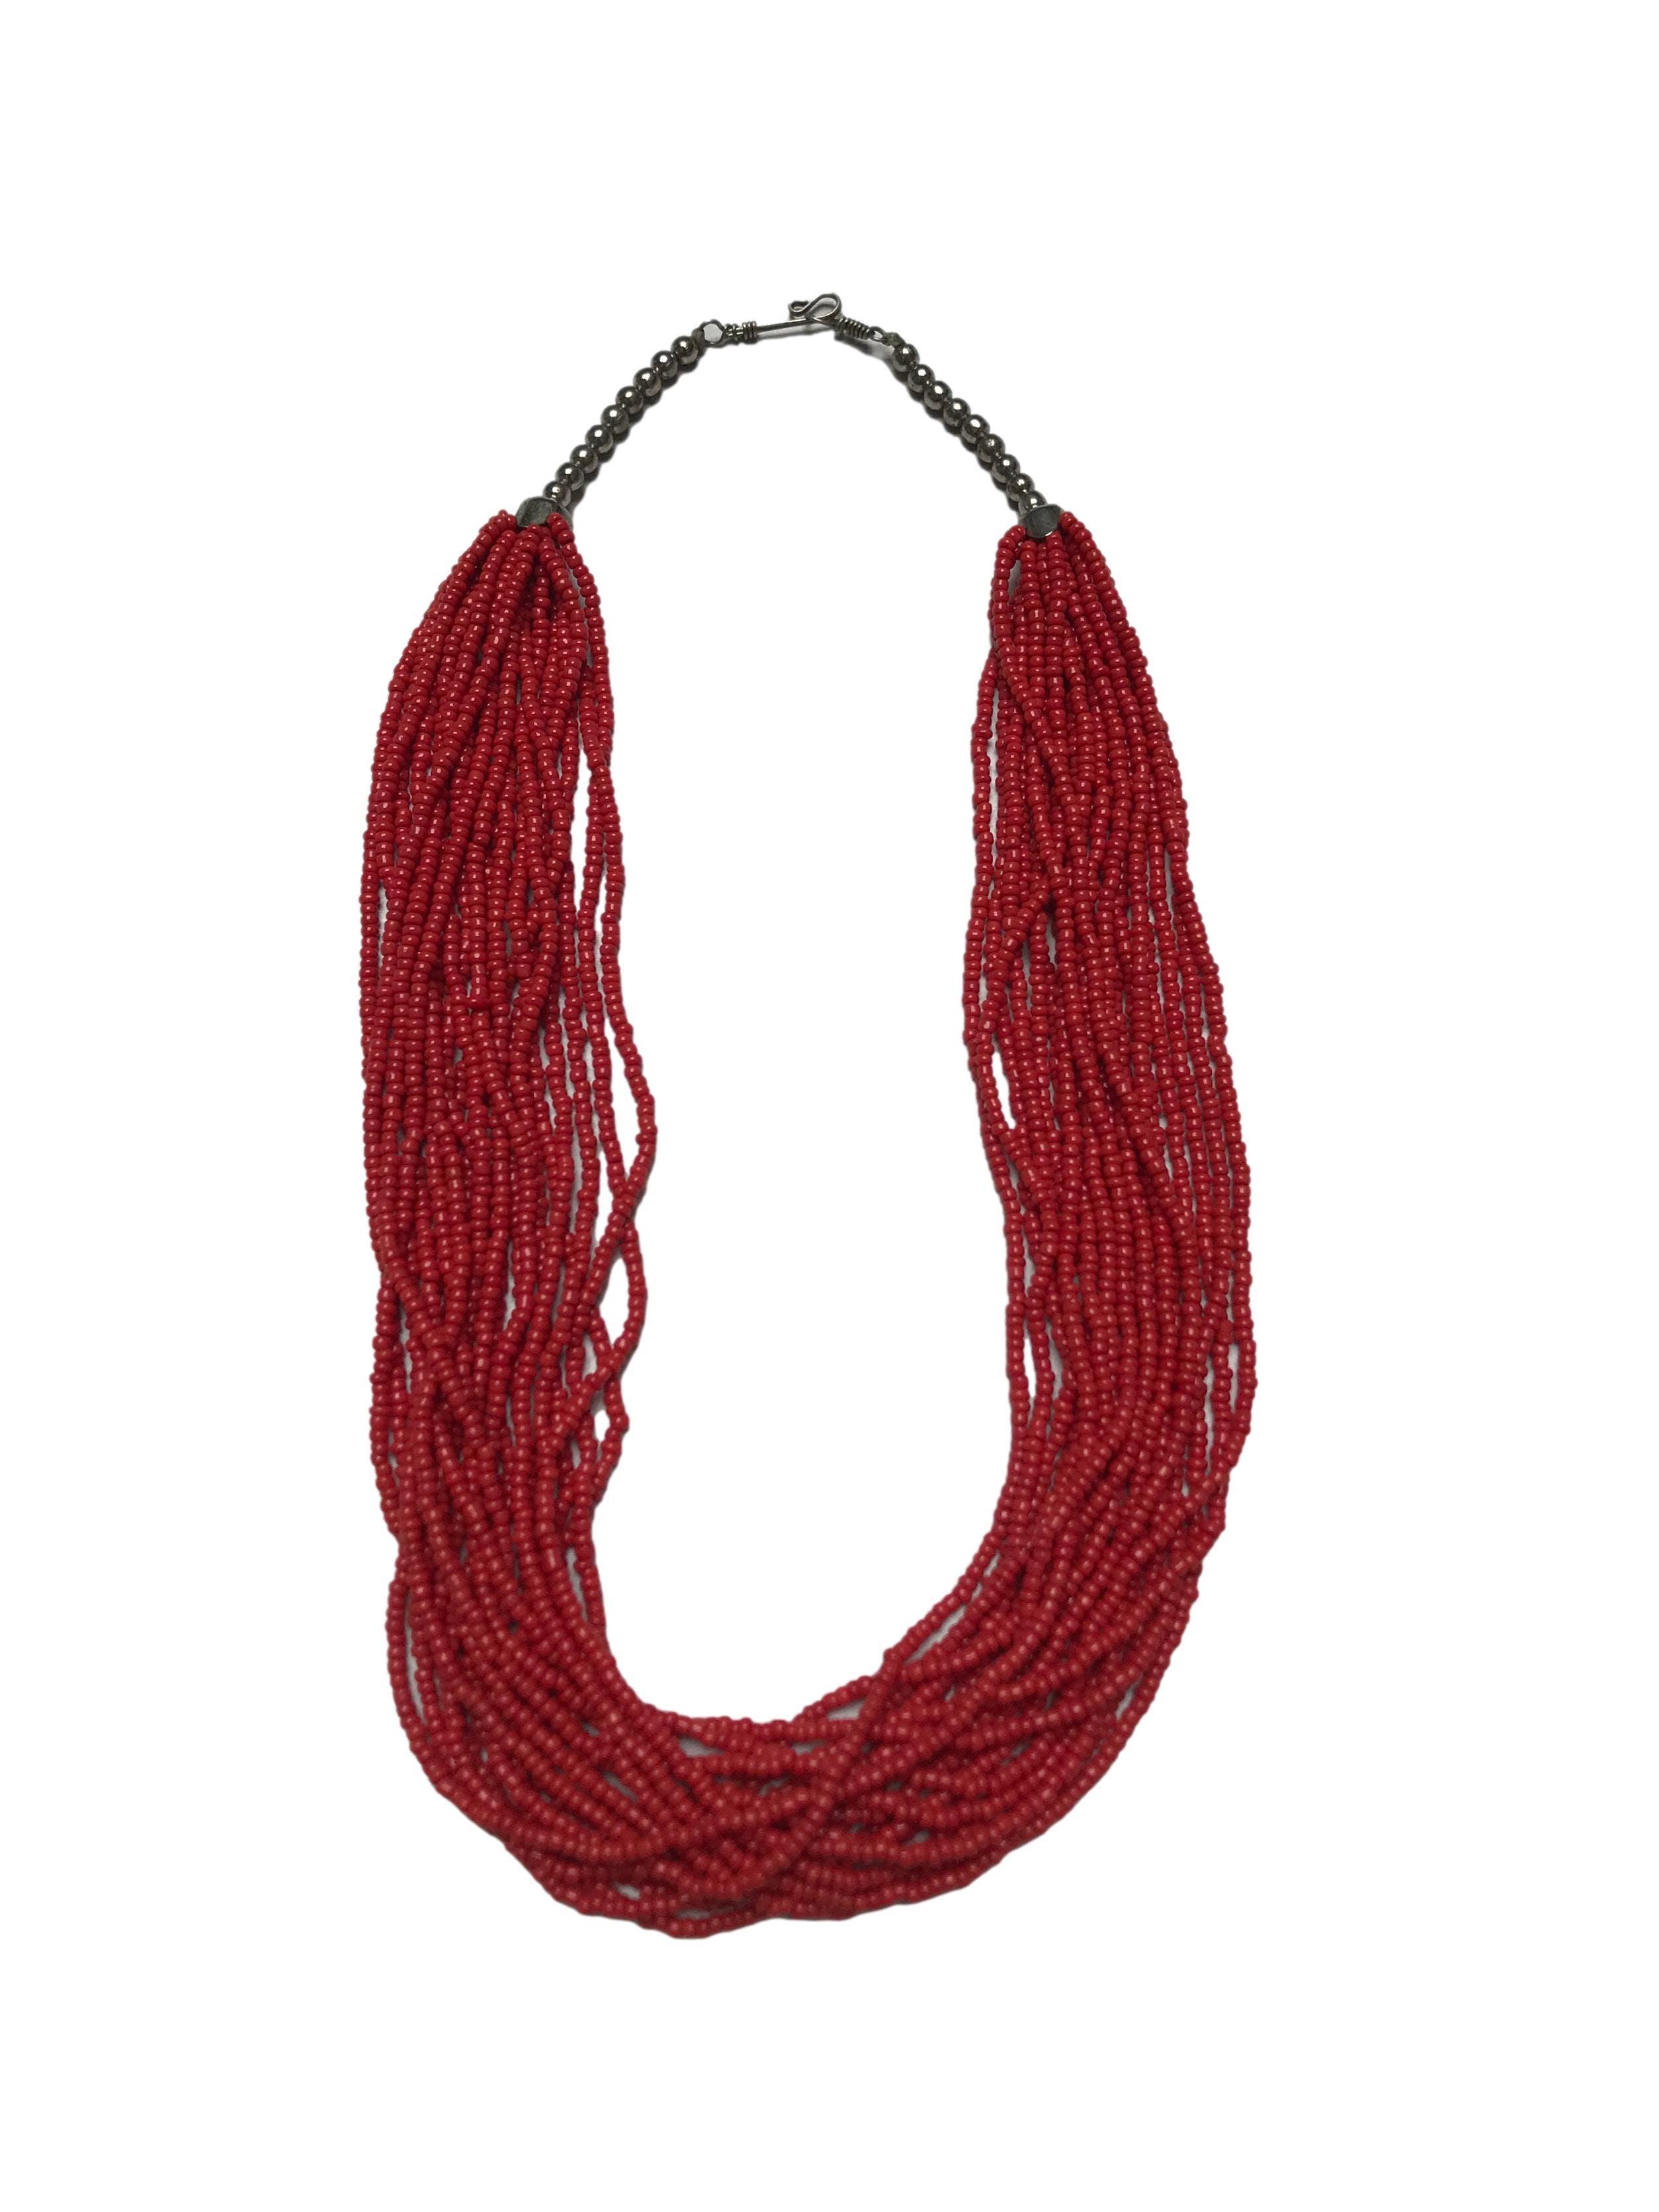 Collar con varias tiras de mostacillas rojas. Largo 50cm